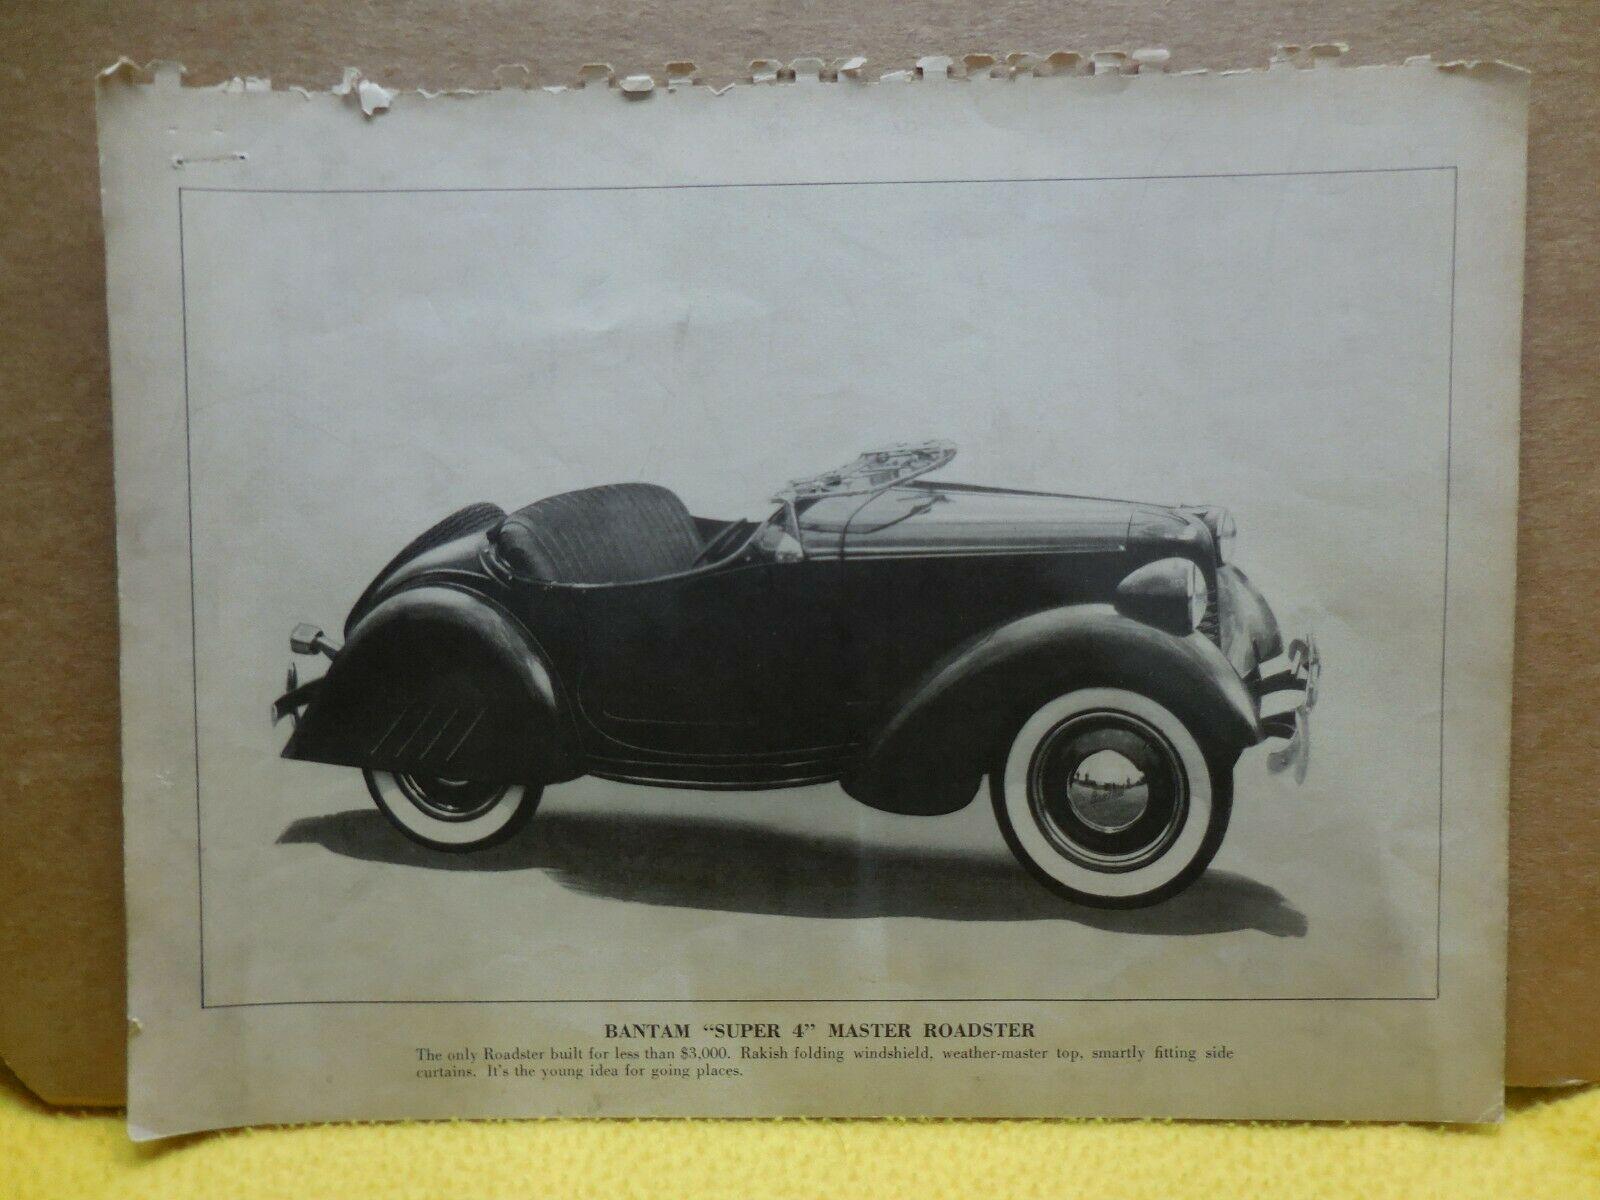 1940 Bantam Roadster Factory Photo